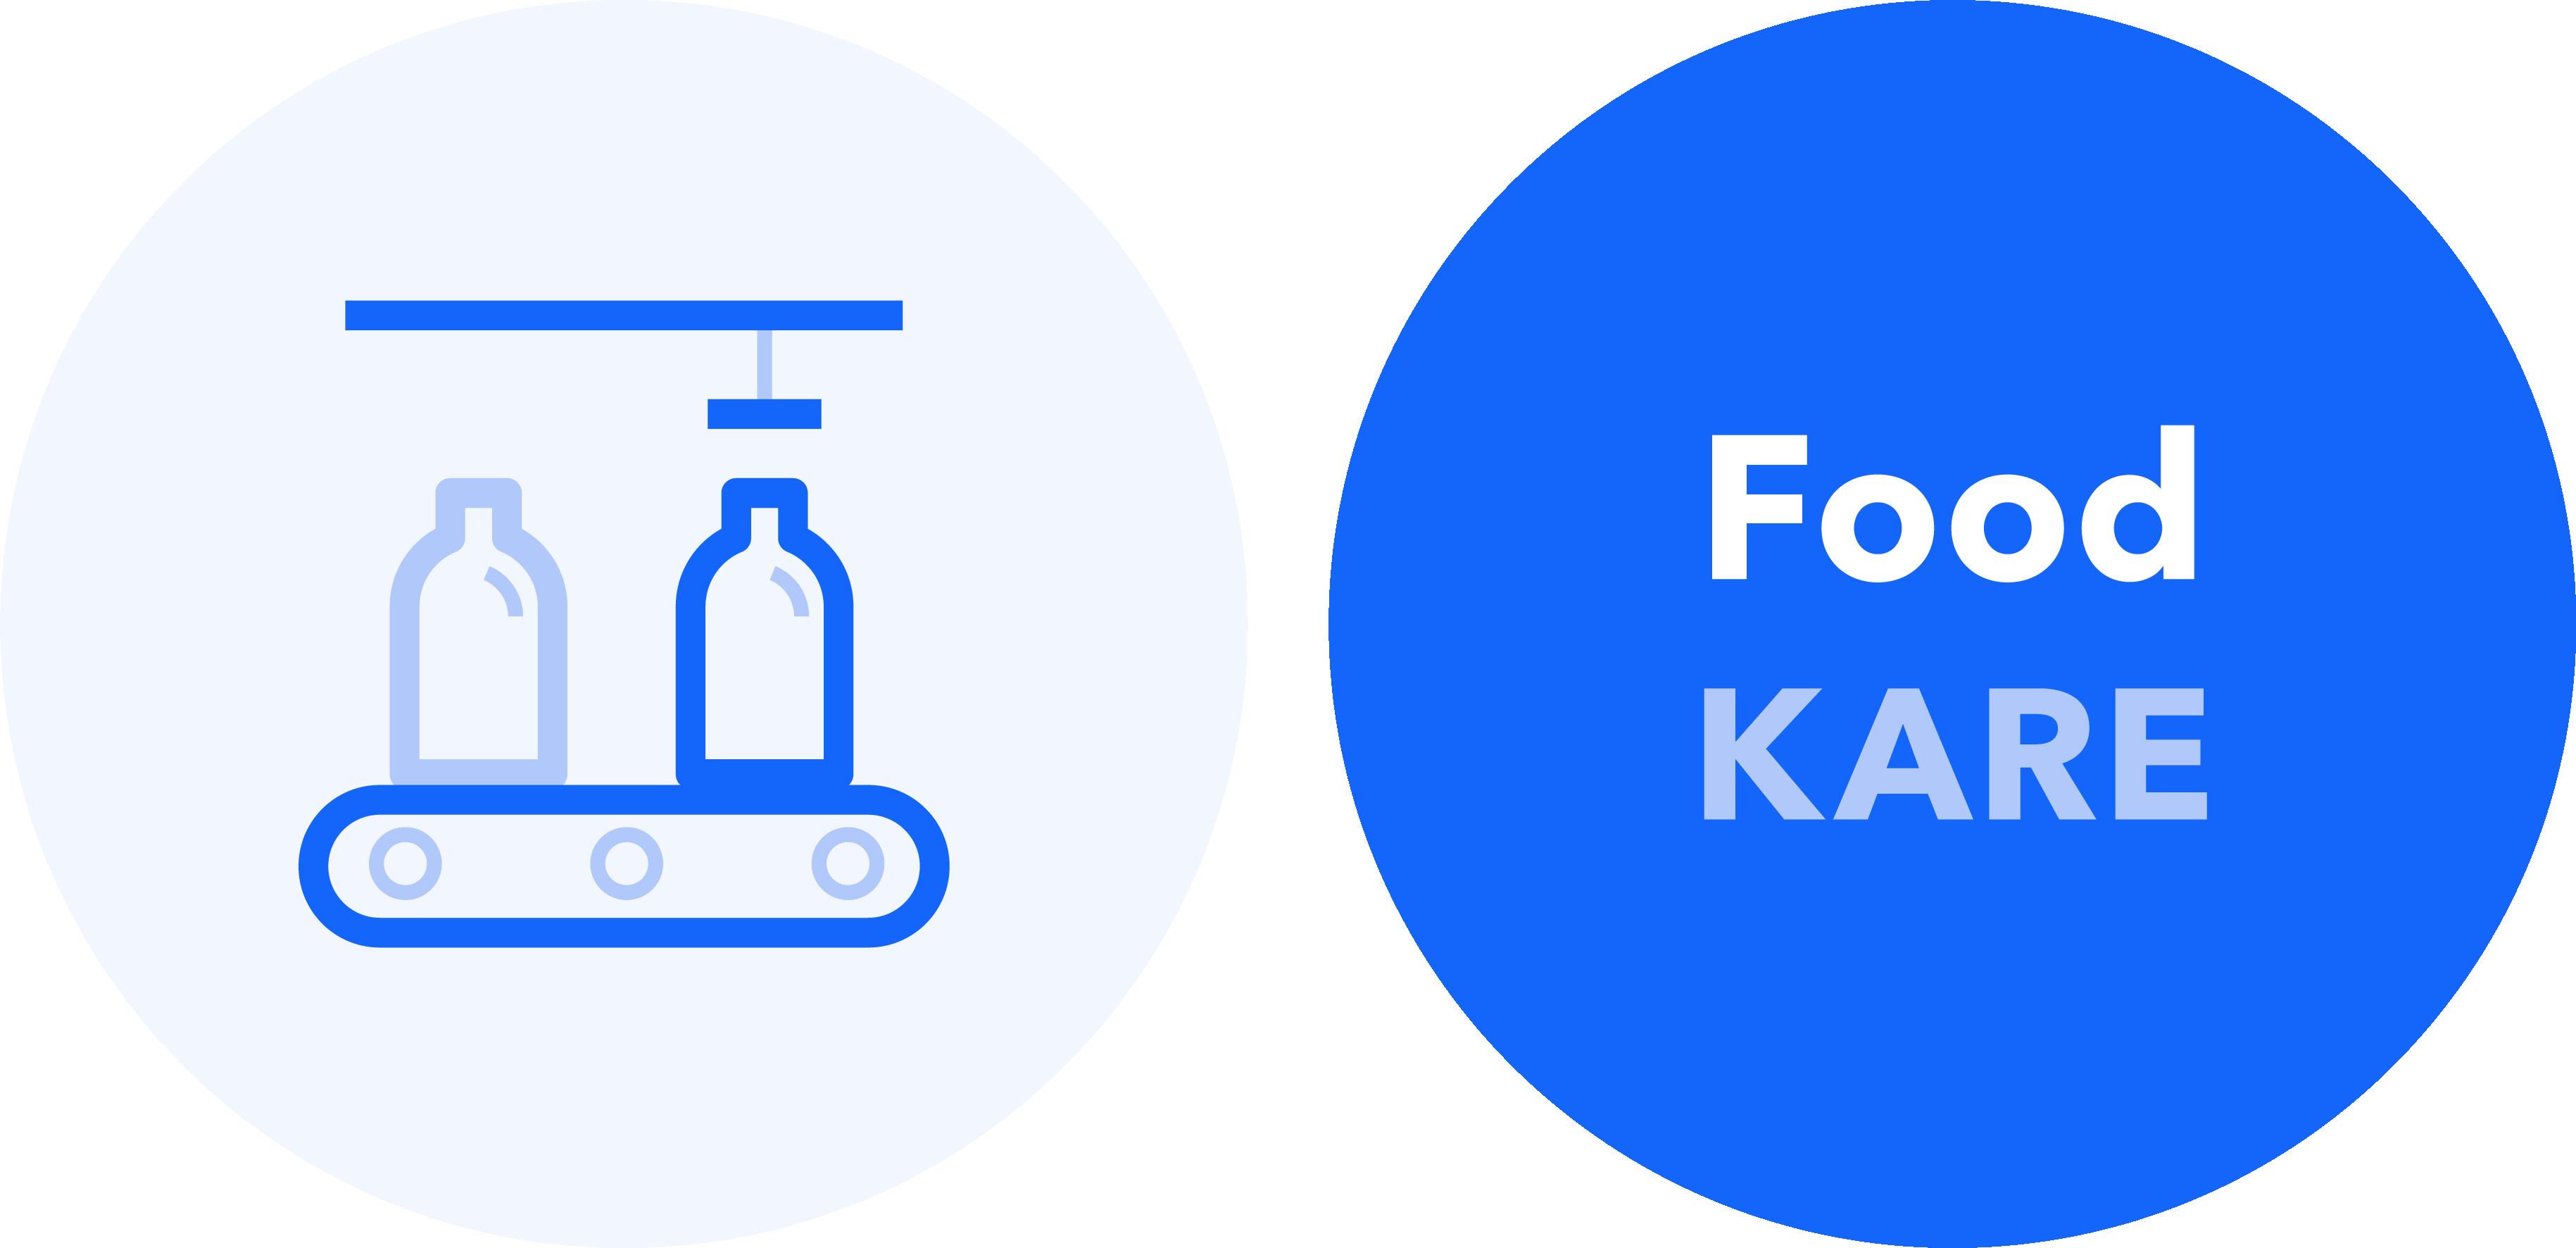 Food Kare icon